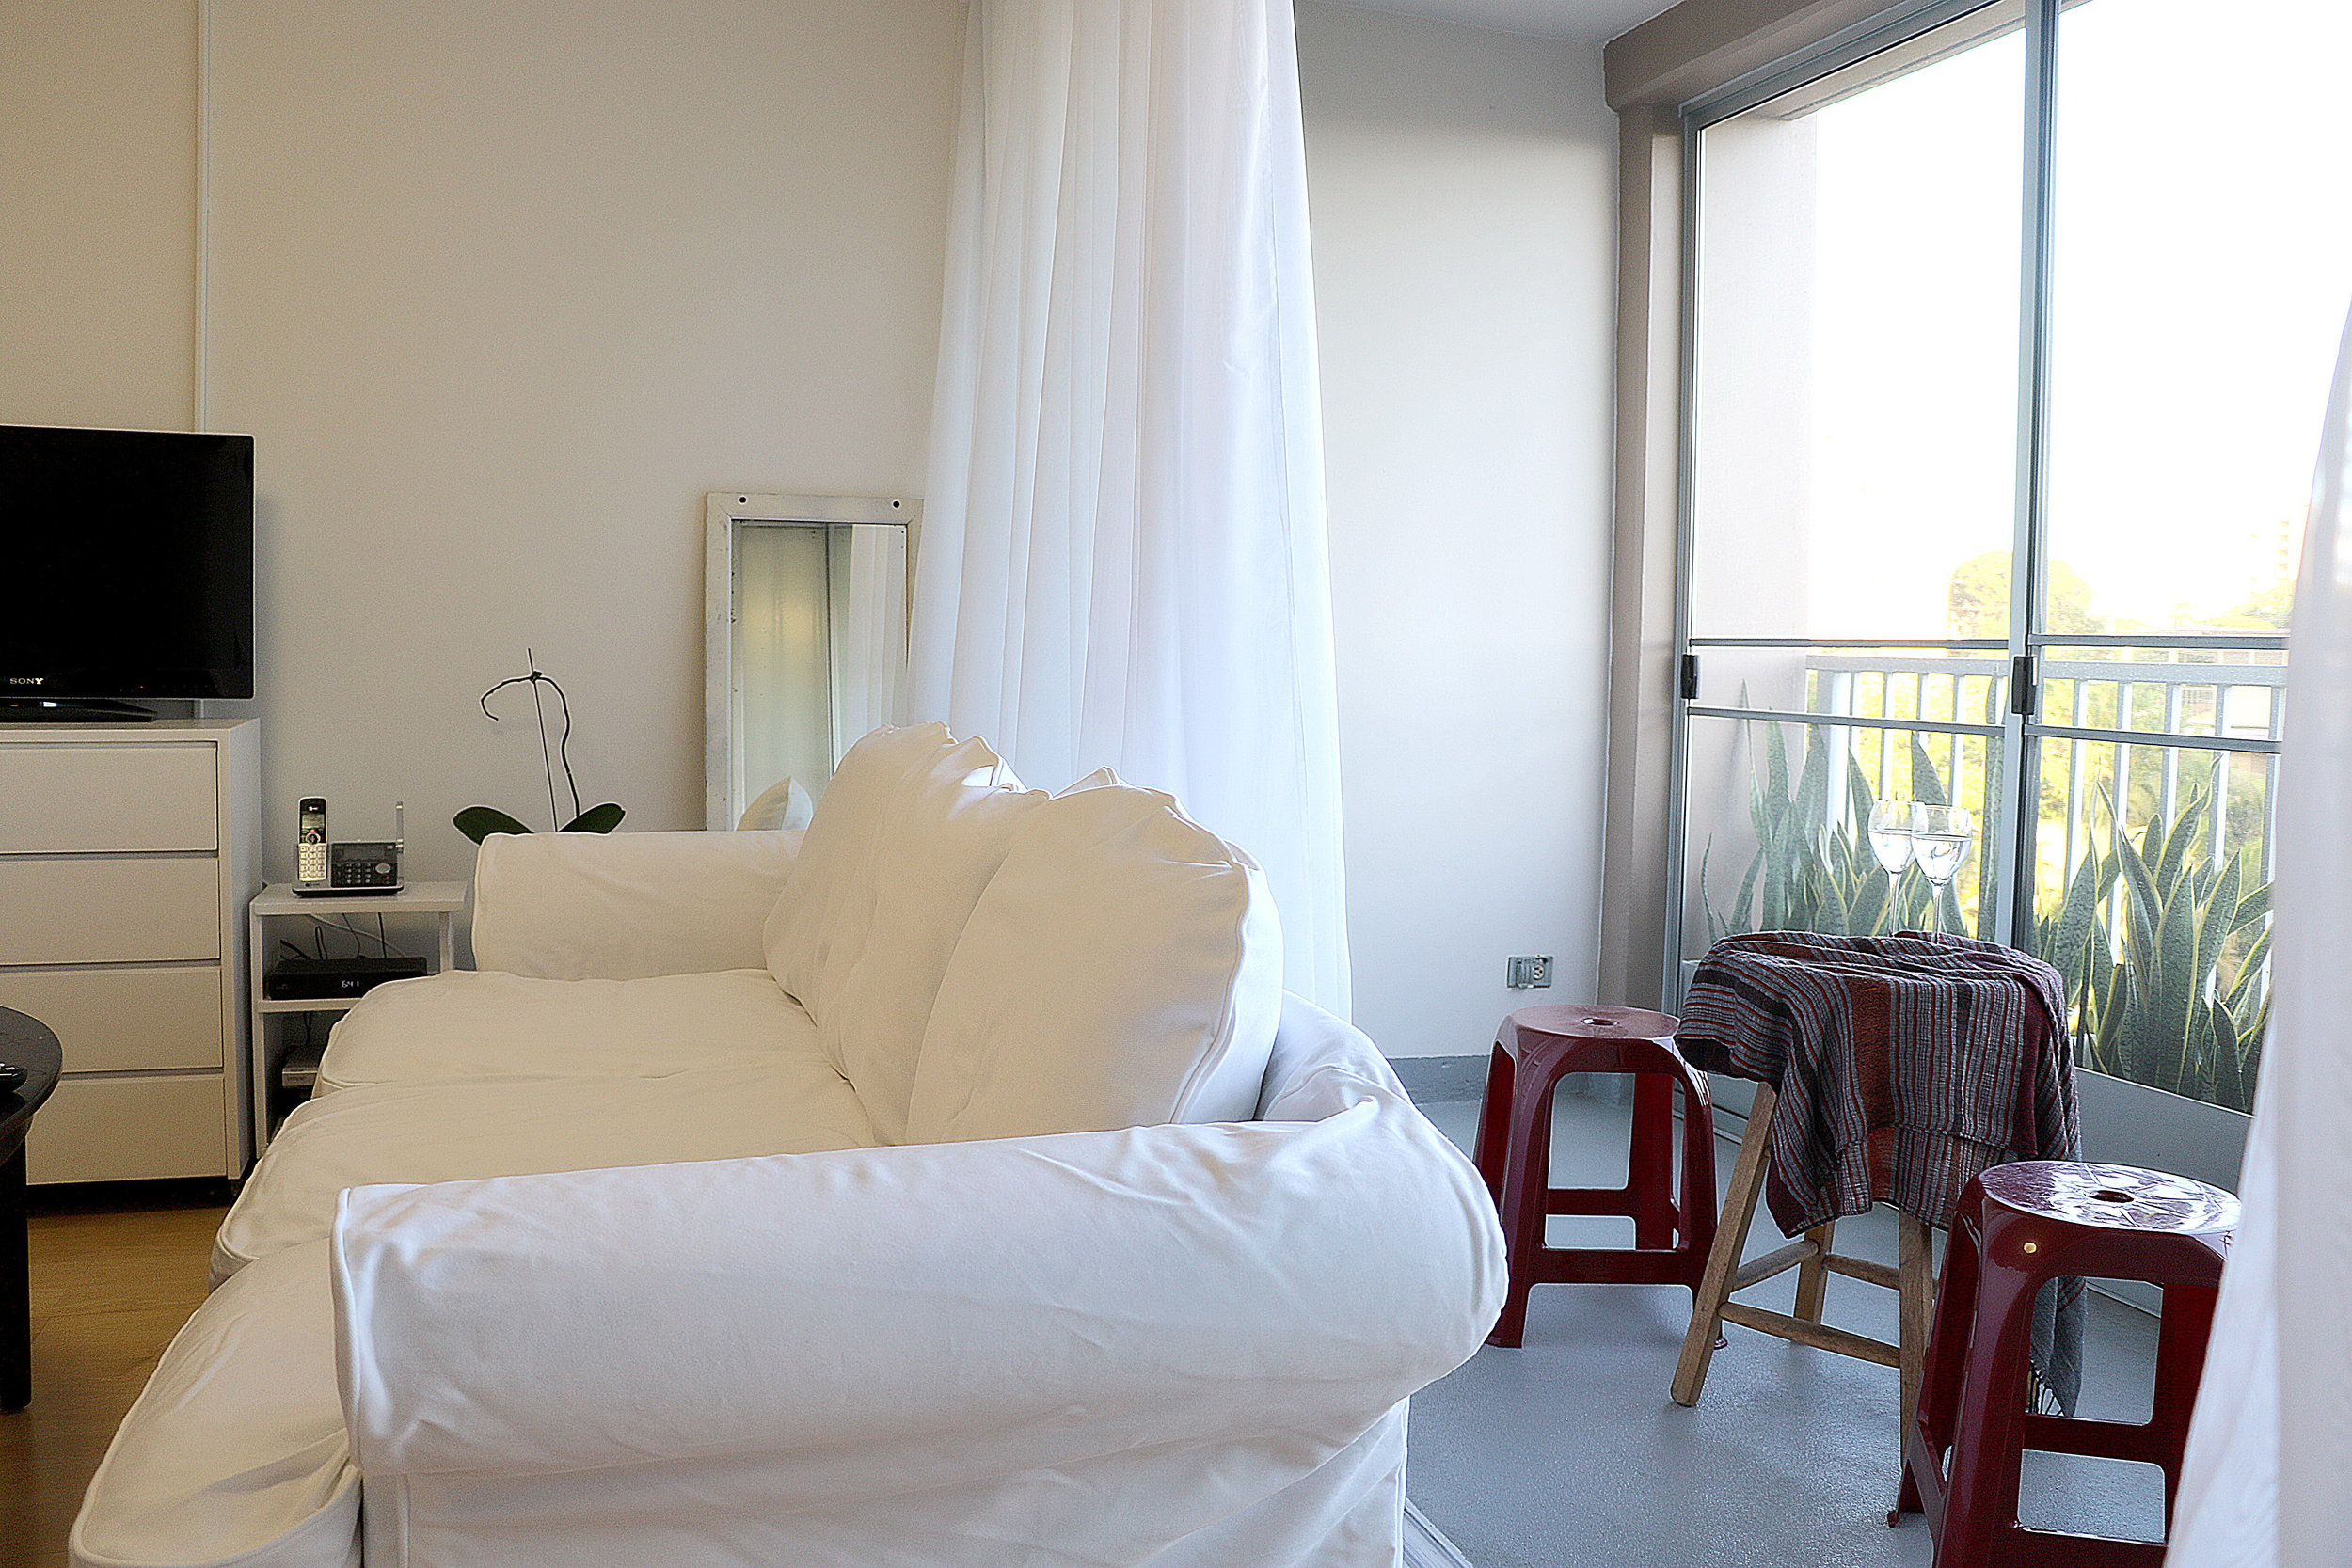 livingroom and lanani.jpg